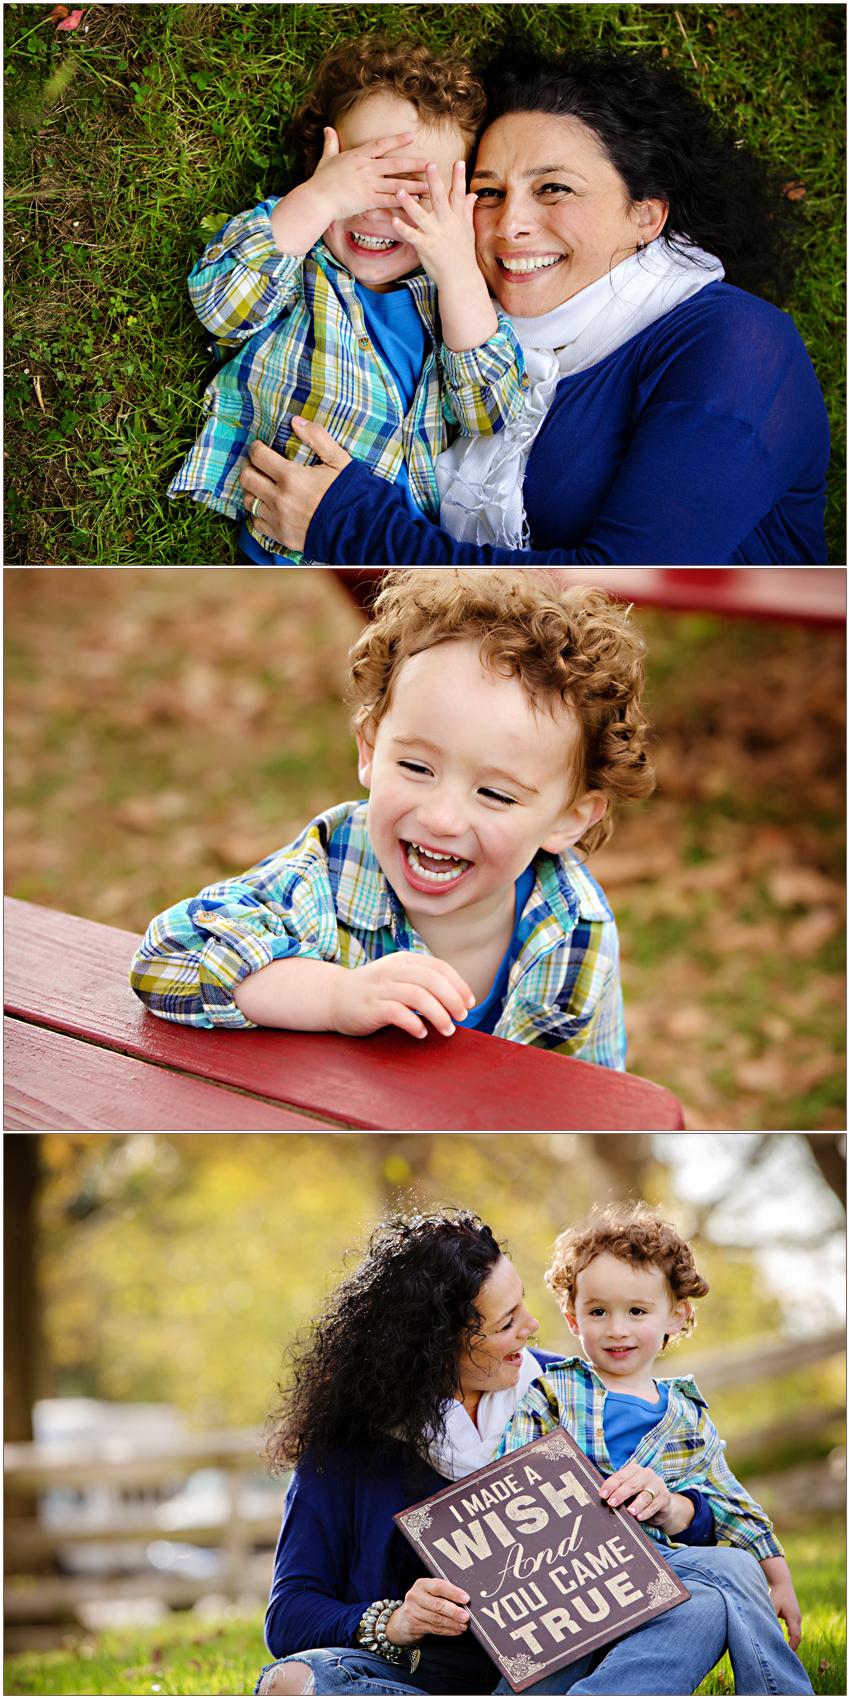 Charlotte Child Photographer Carolyn Ann Ryan captures adorable giggles